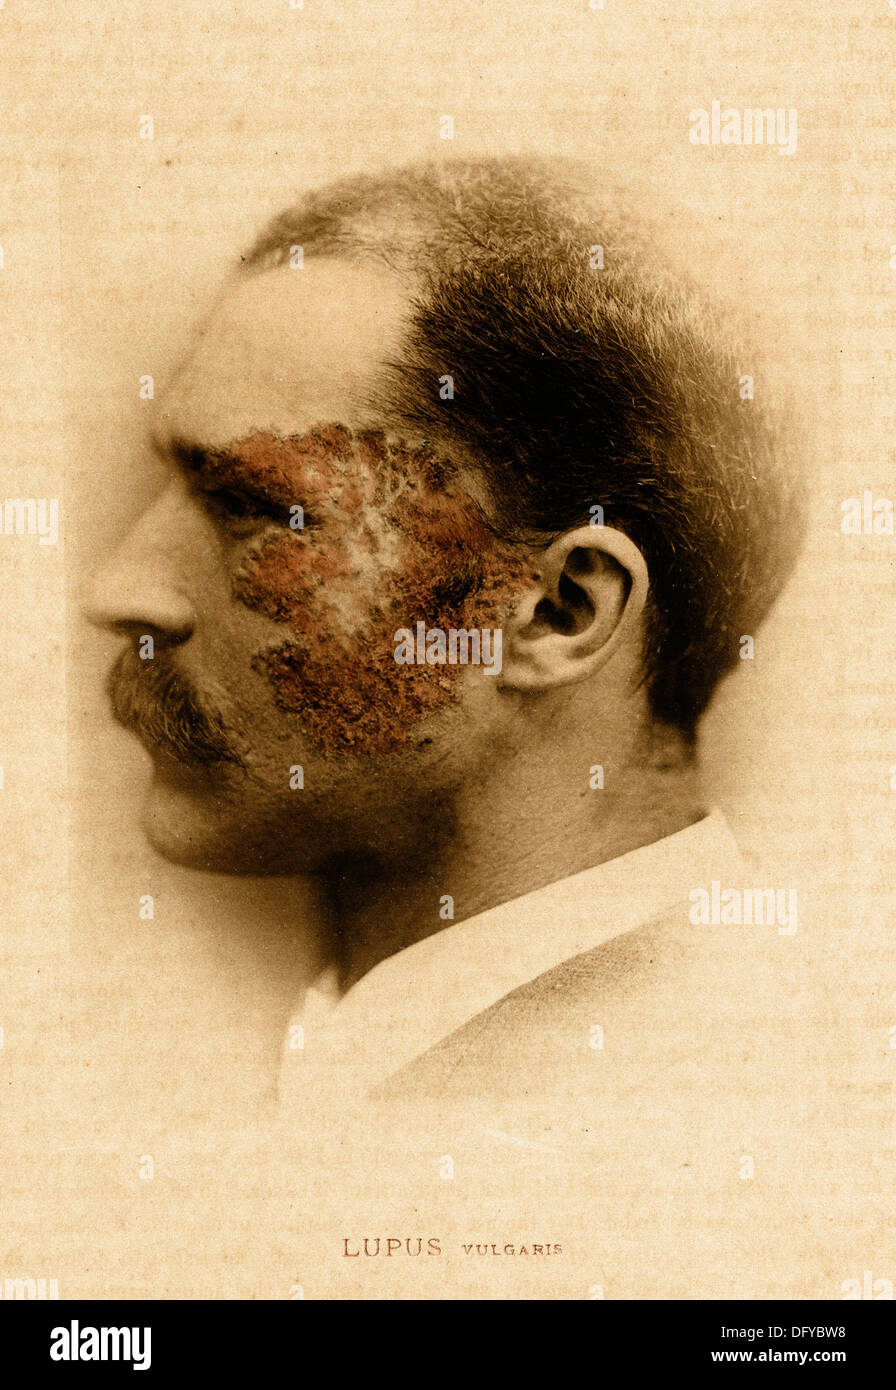 Lupus, ca 1881, by E. Bierstadt - Stock Image